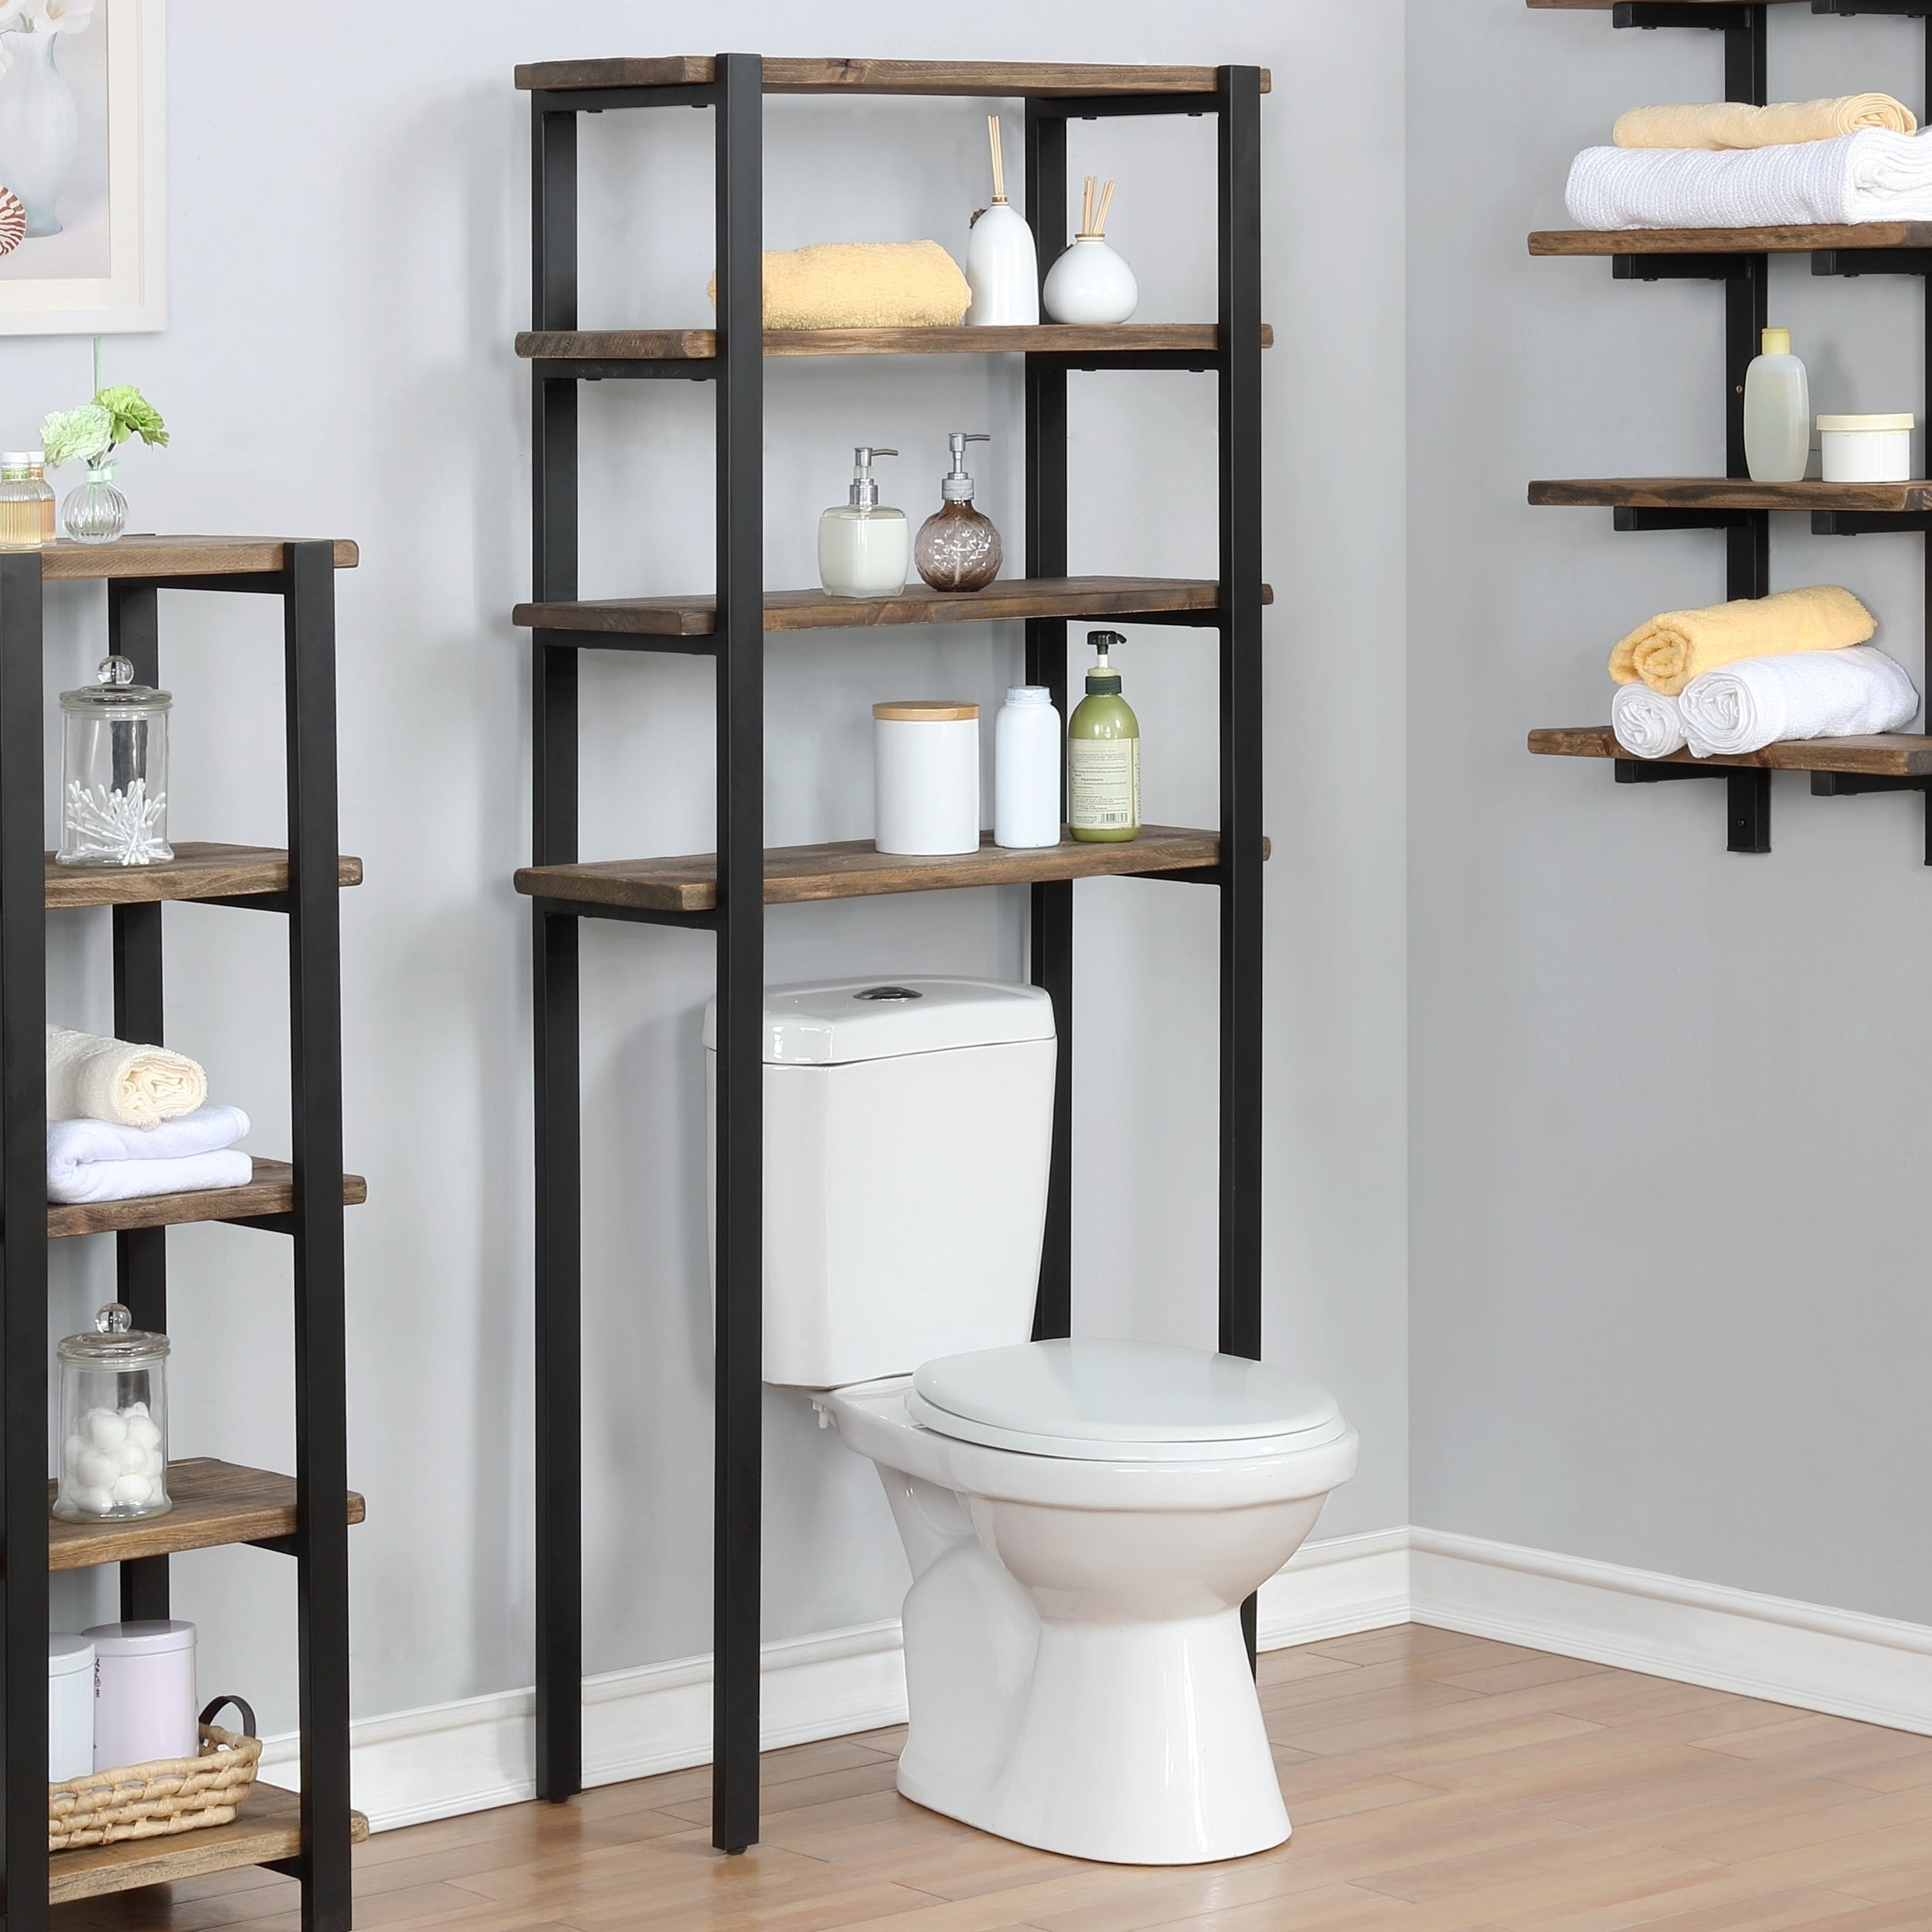 ideas for small bathroom bathroom shelf over toilet wallpaper